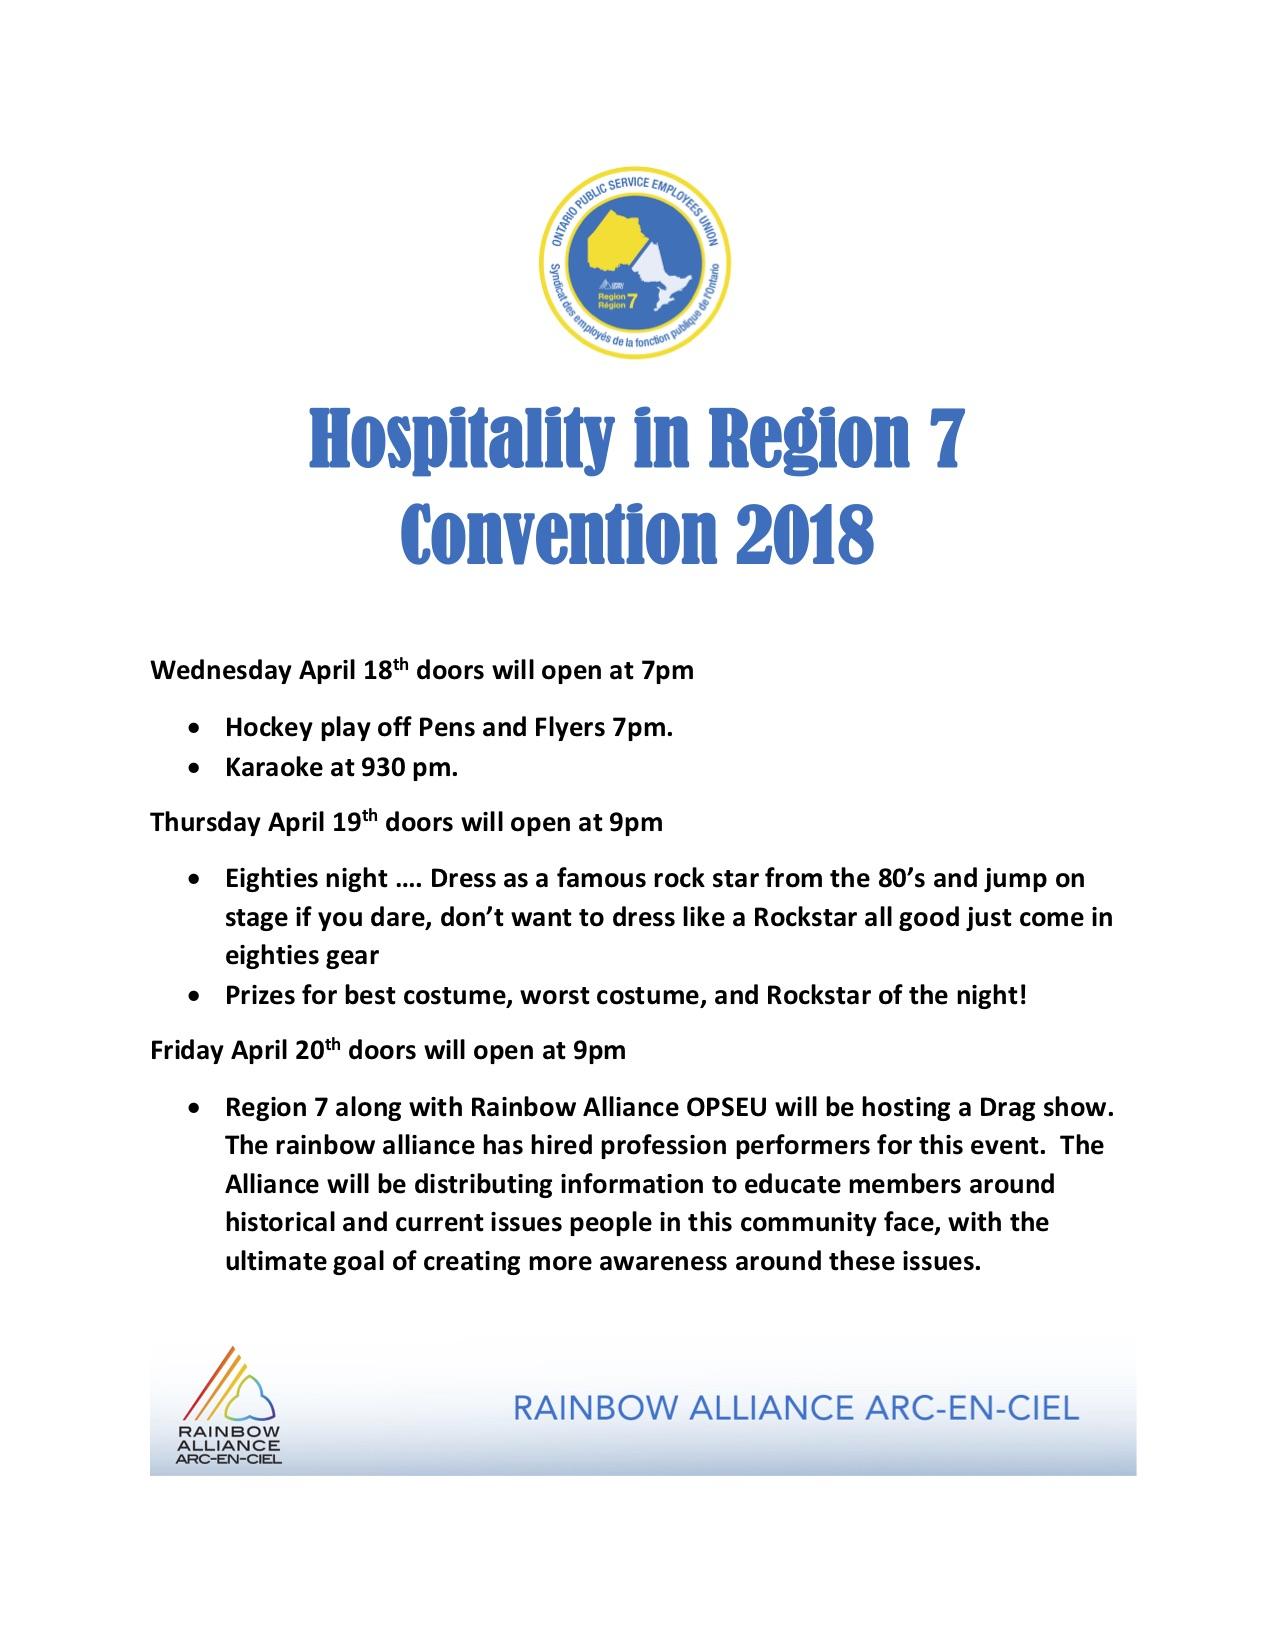 region 7 State lands open to the public in oswego, cayuga, onondaga, madison, tompkins, cortland, chenango, tioga and broome counties.